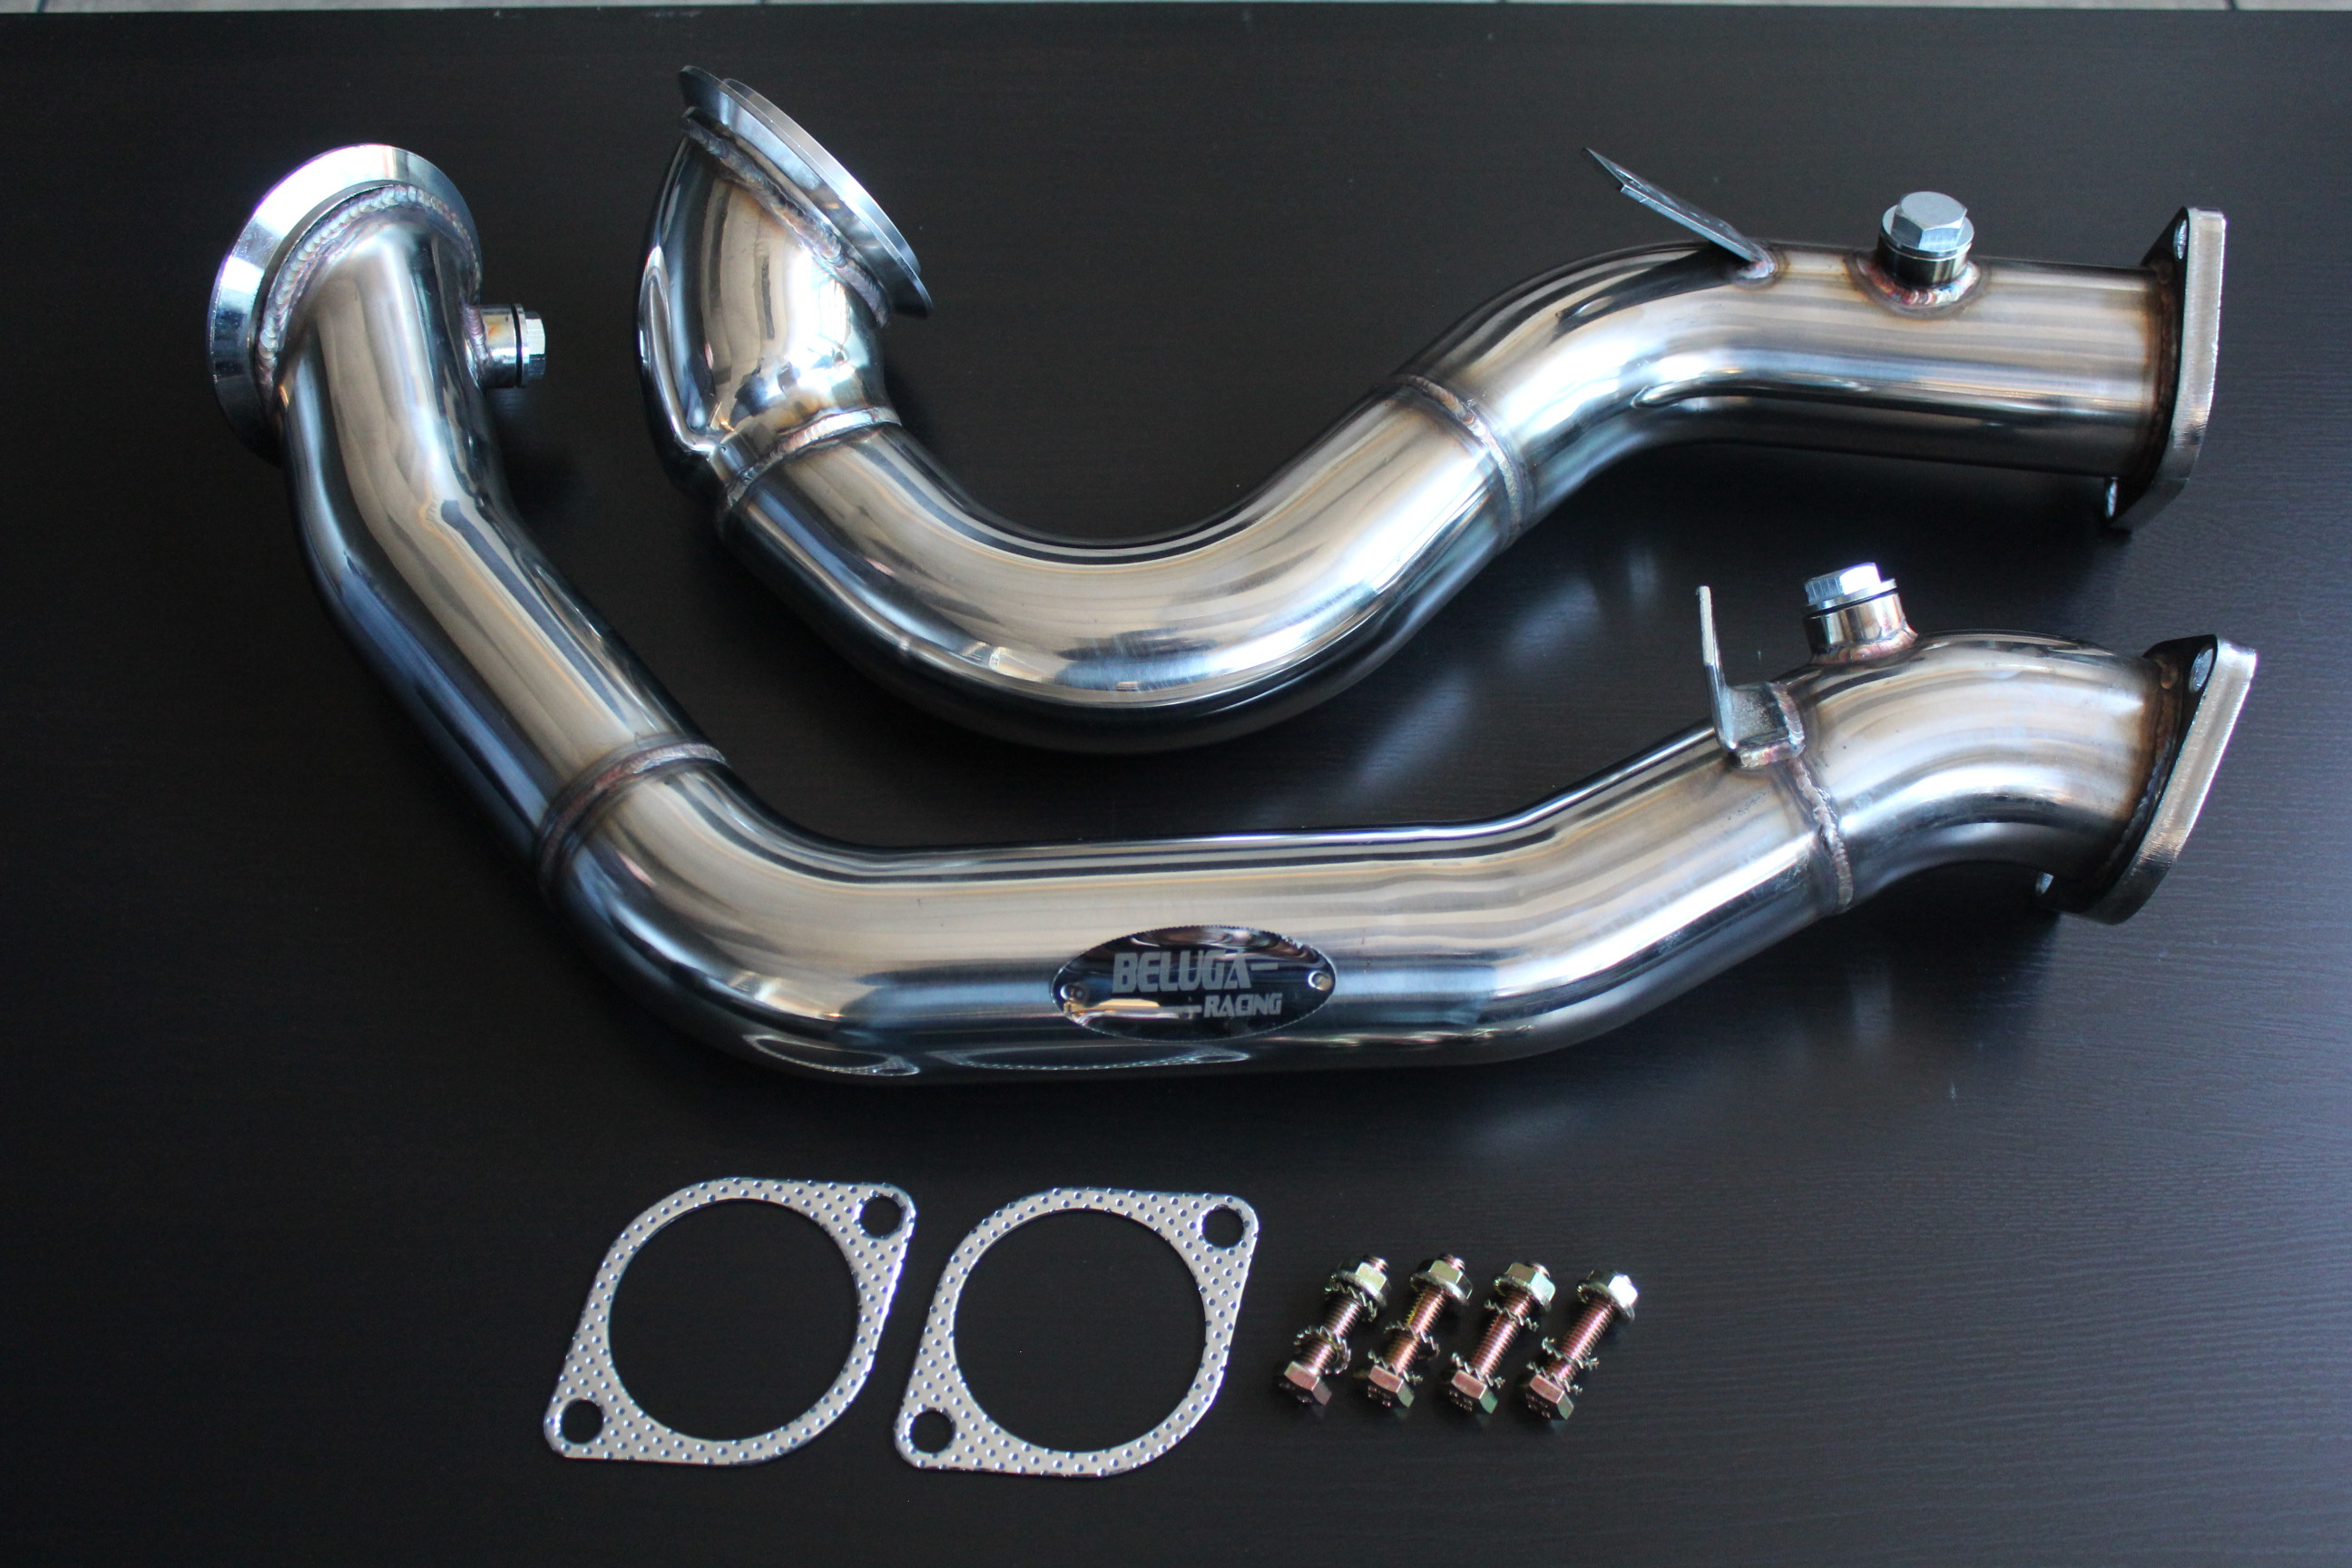 BMW 335Xi For Sale >> BMW 07-10 335i / 335xi TT N54 B30 E90 E91 E92 E93 N54 Twin ...